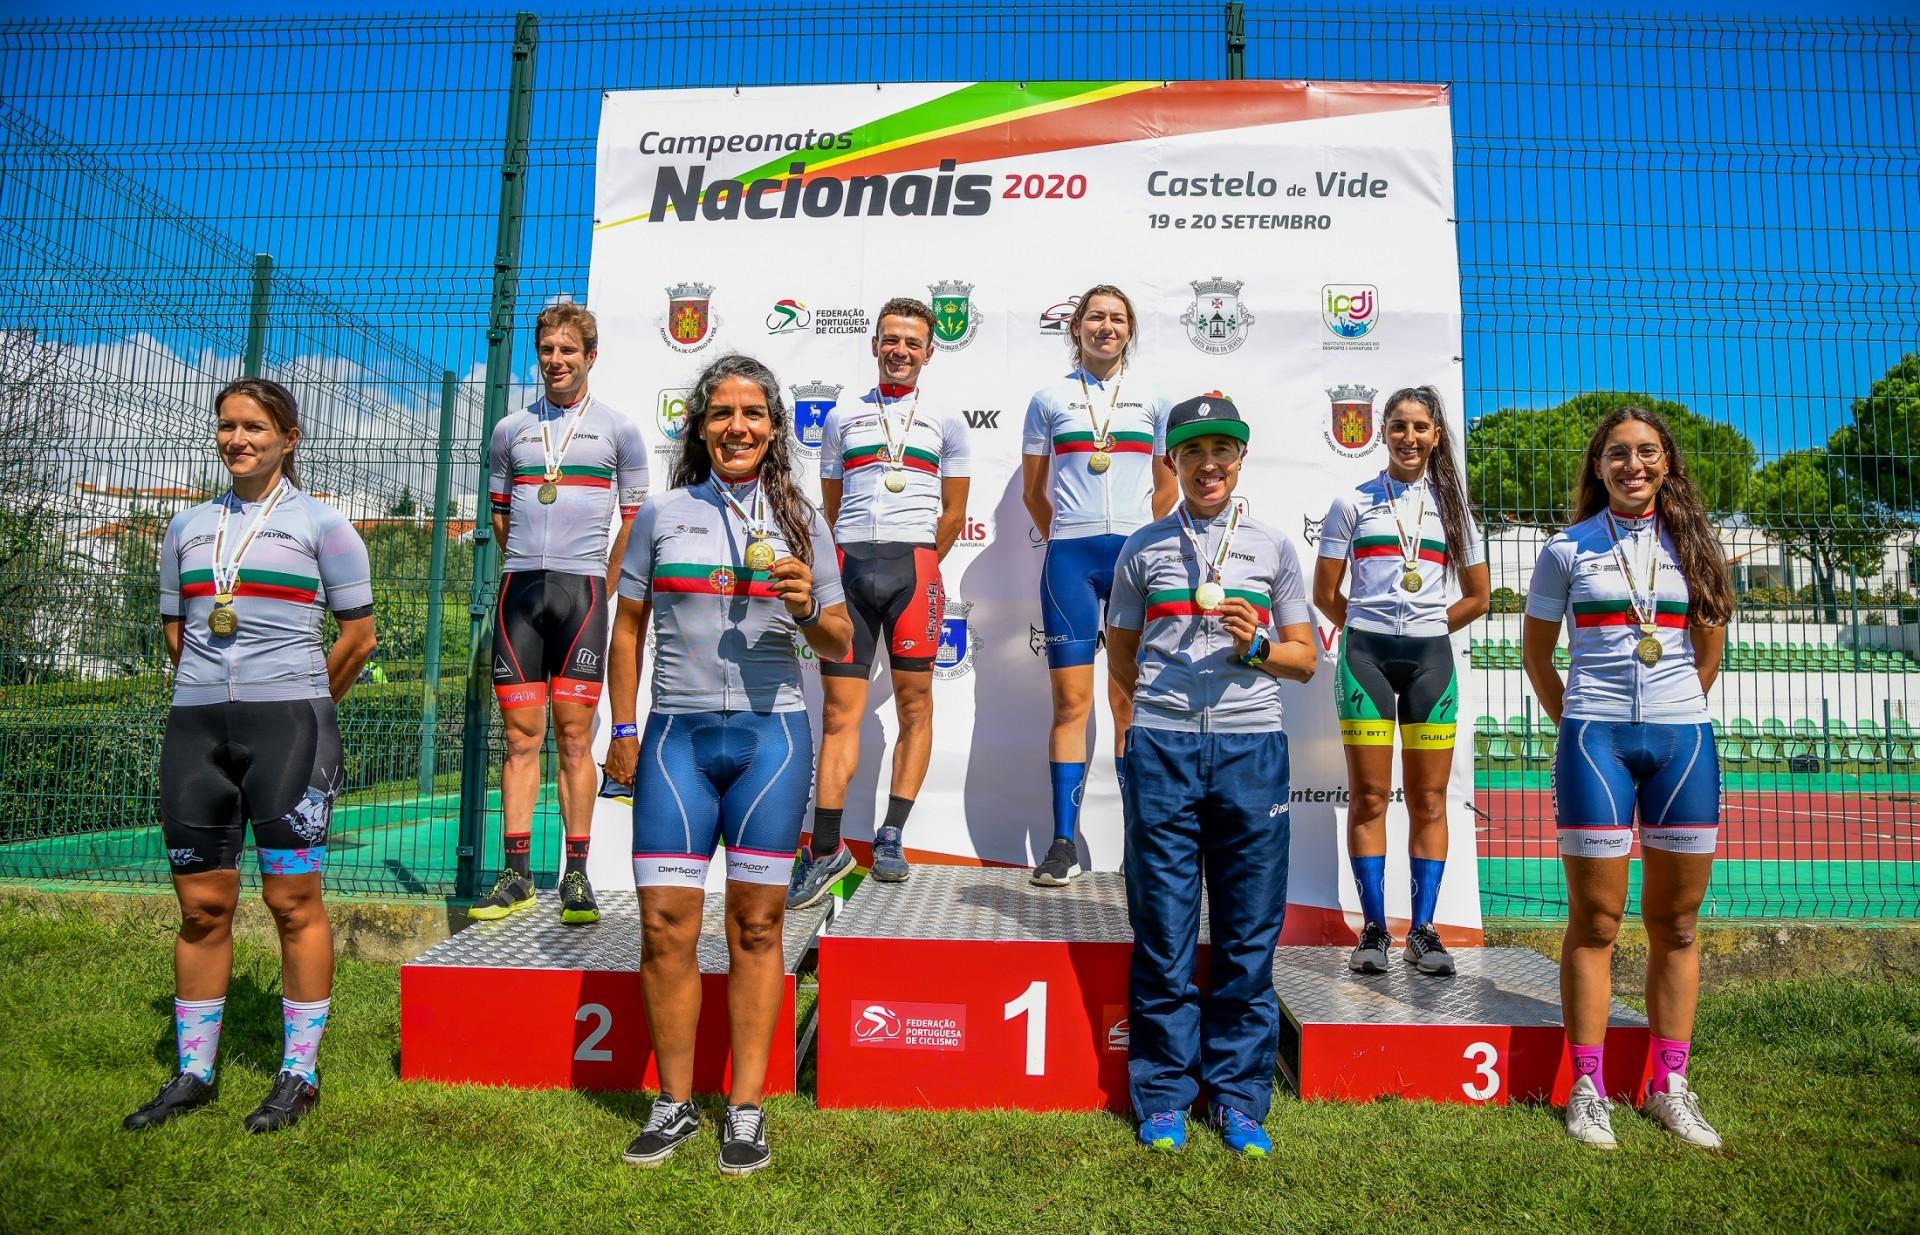 Raquel Queirós campeã nacional de contrarrelógio